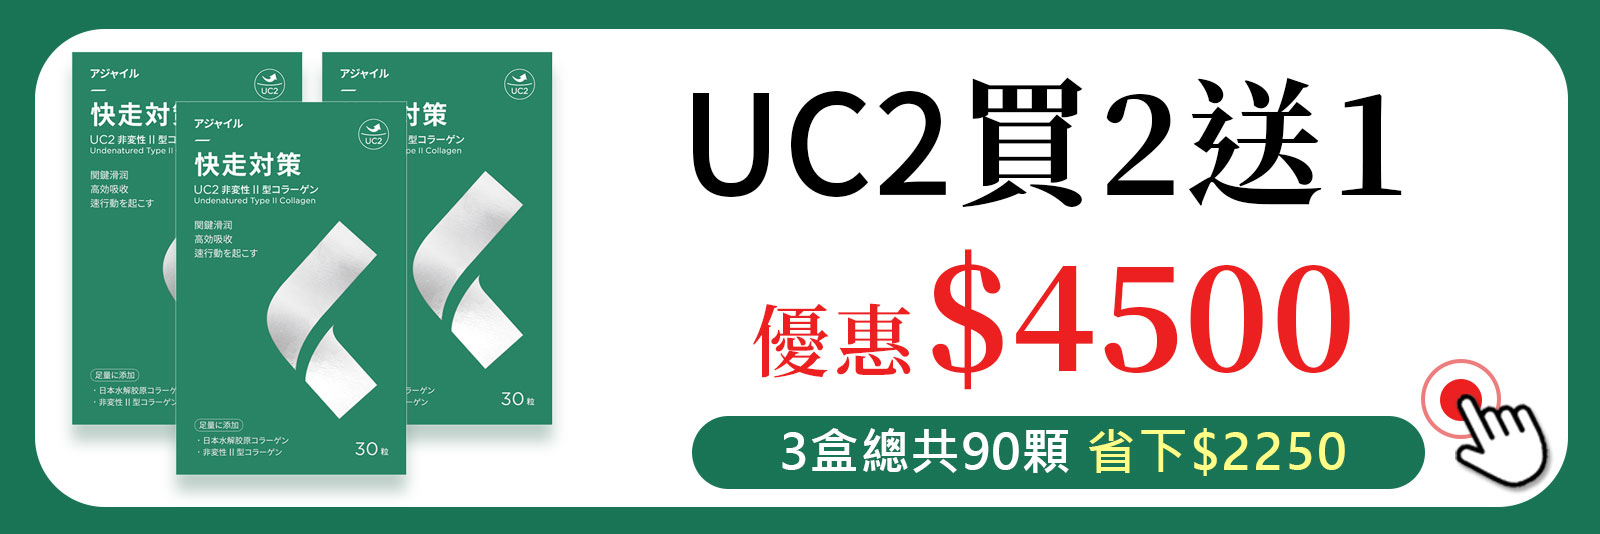 UC快走對策90天份-買2送1總共90顆4500元省下2250元